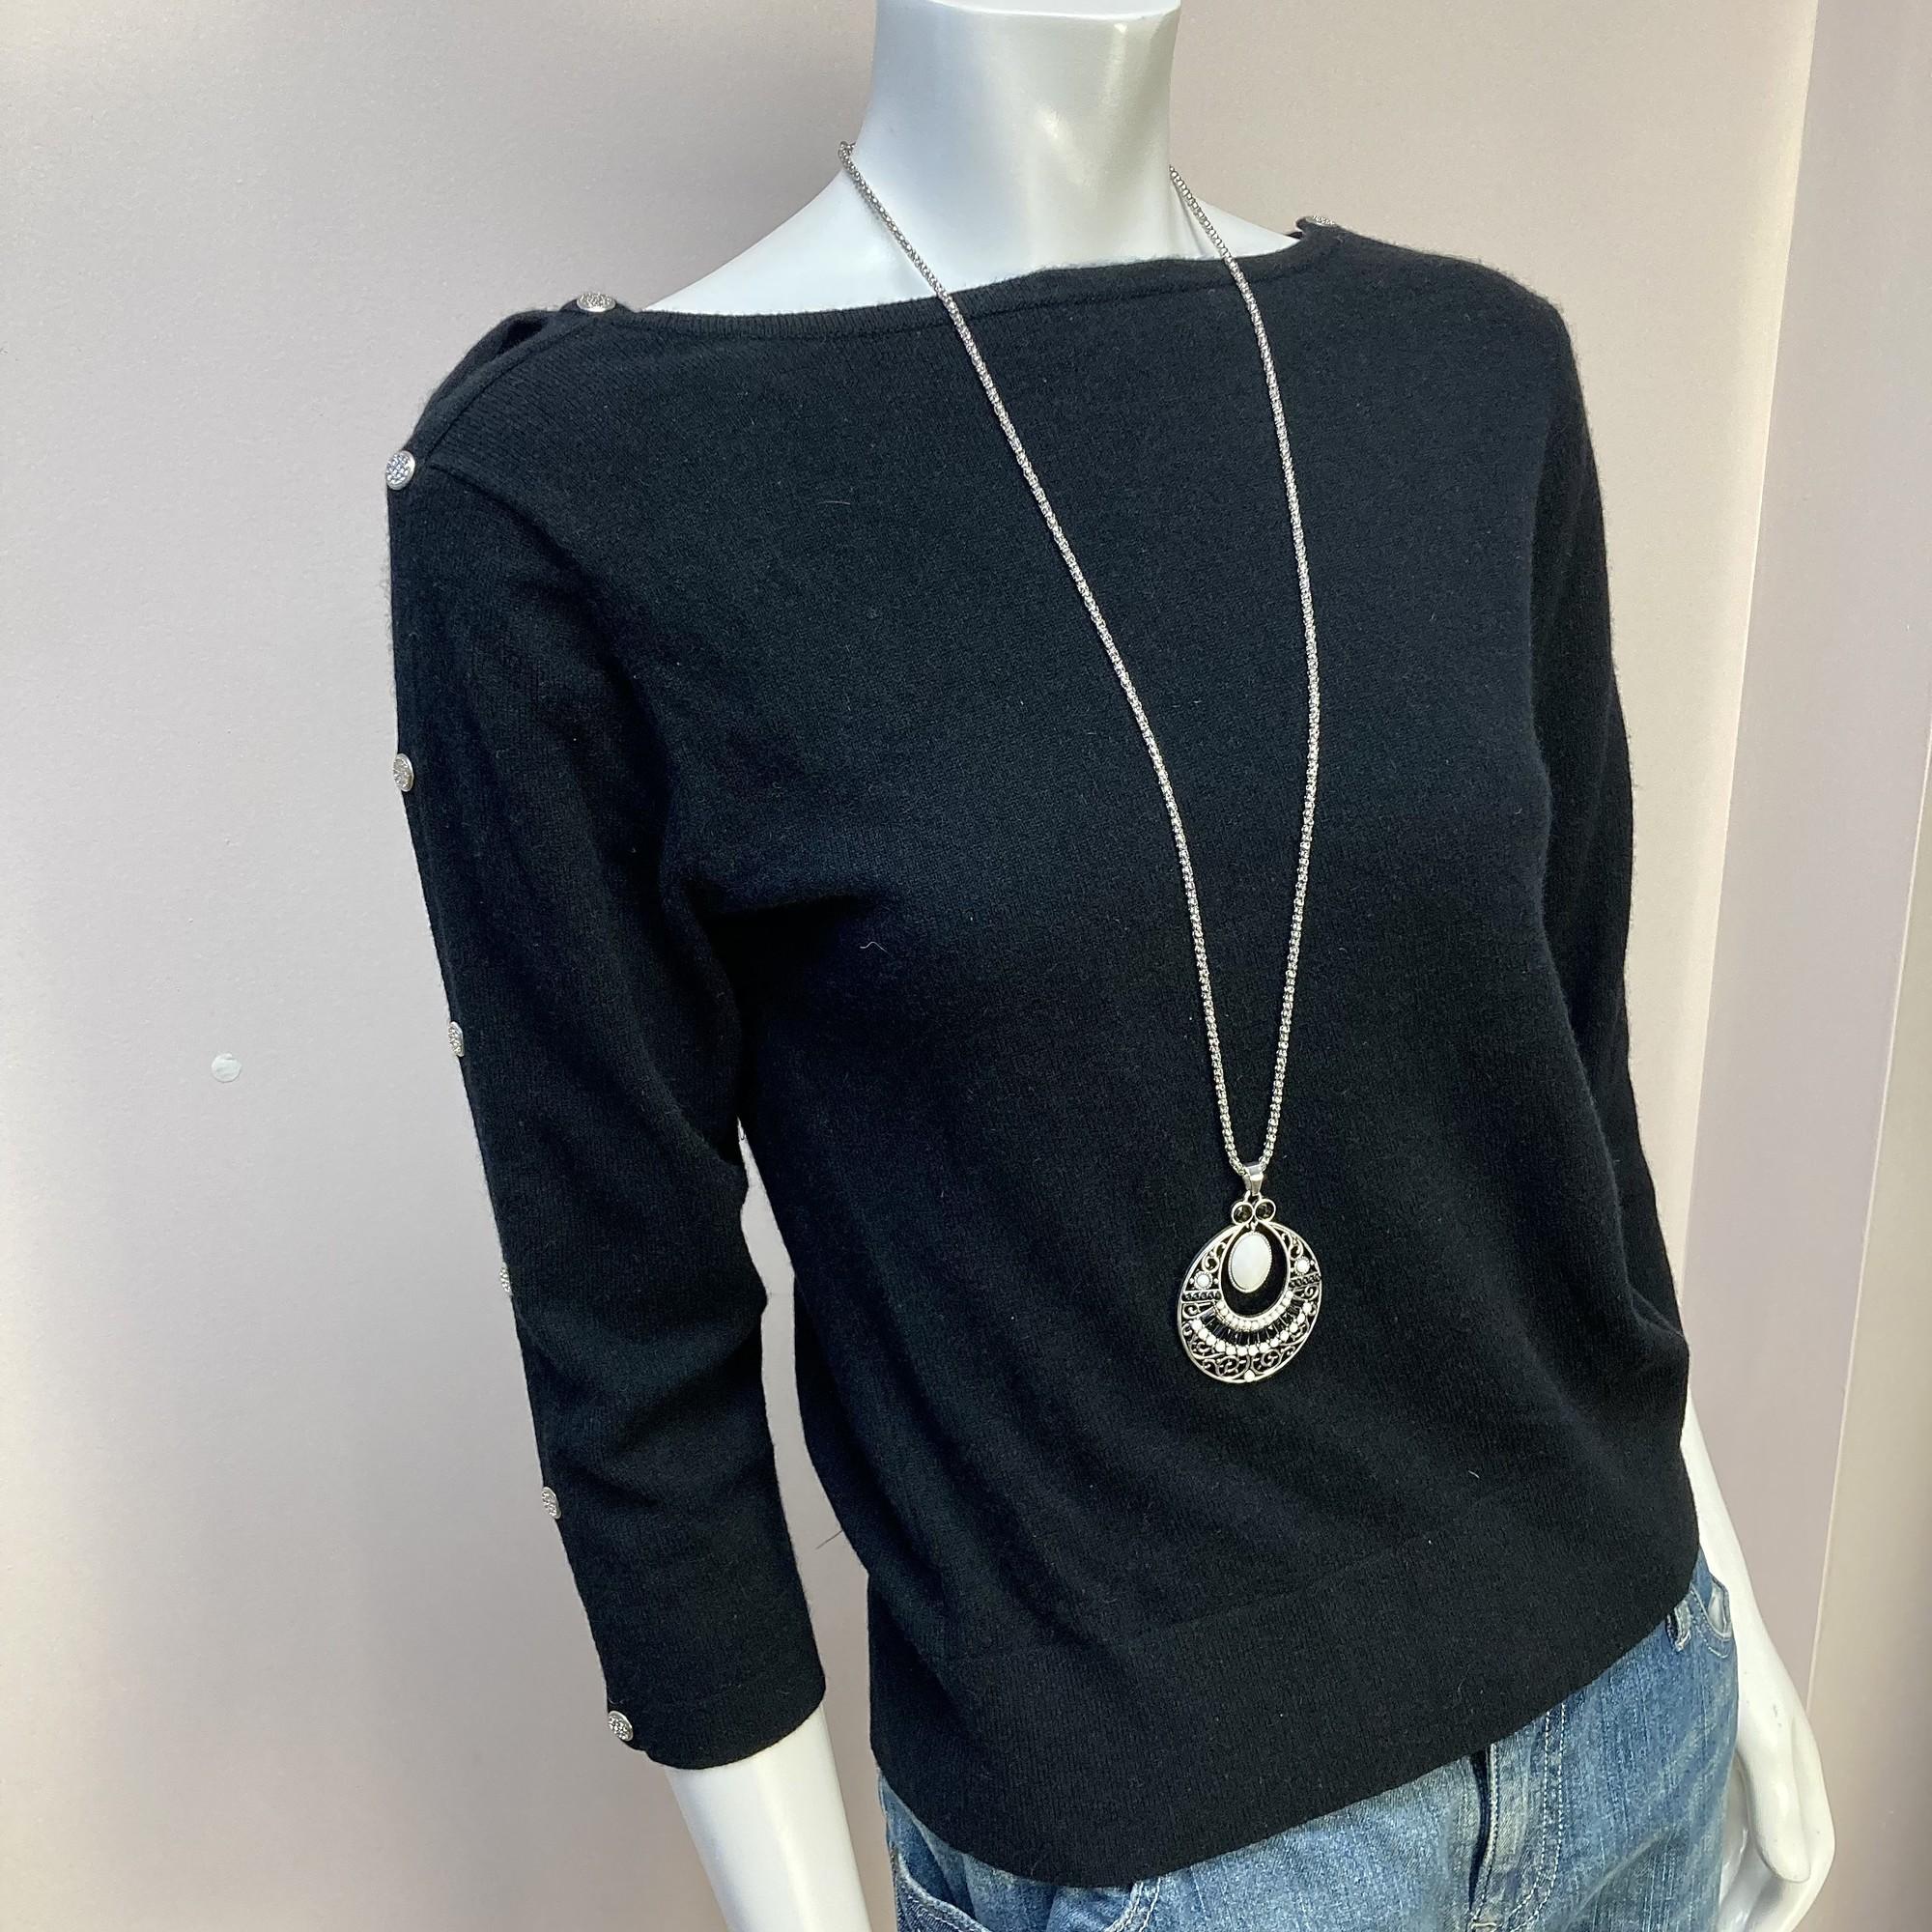 Autumn Cashmere Sweater, Black, Size: L